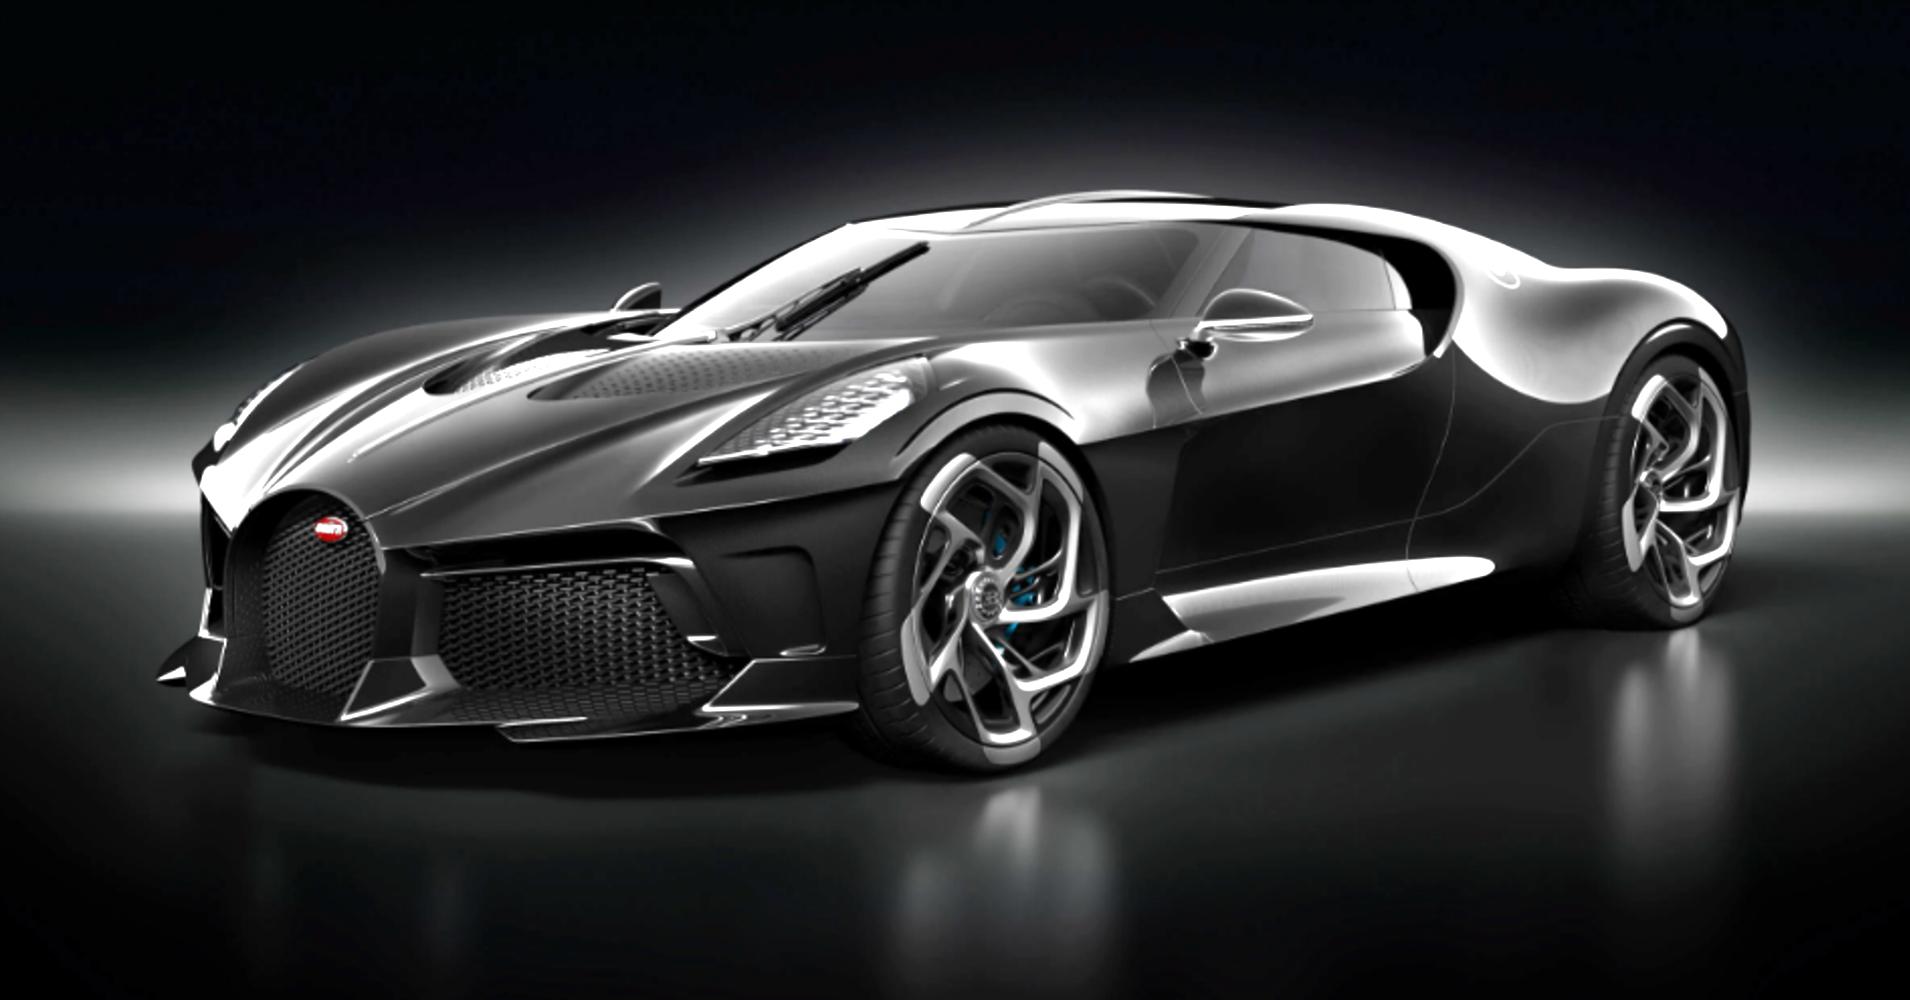 new model wallpaper,land vehicle,vehicle,car,automotive design,sports car